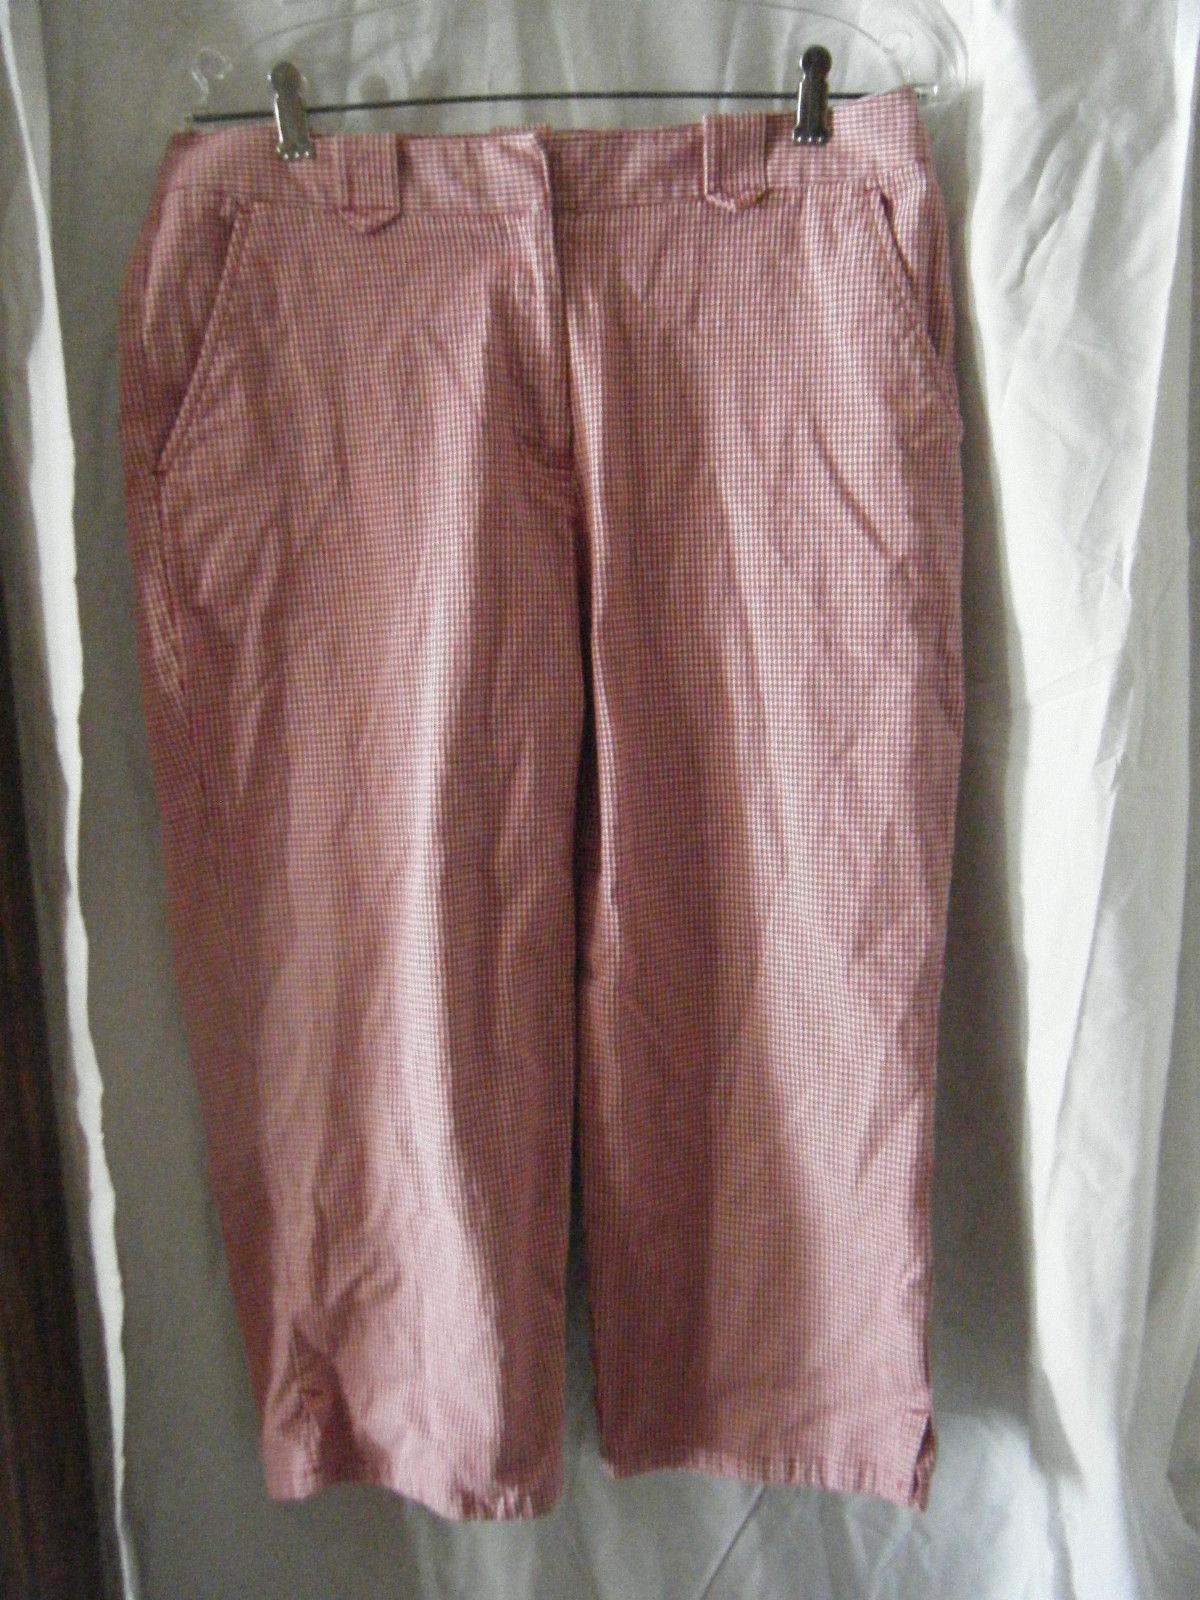 Liz Claiborne Villager Red & White Check Stretch Capri Pants - Size 10 - $14.71